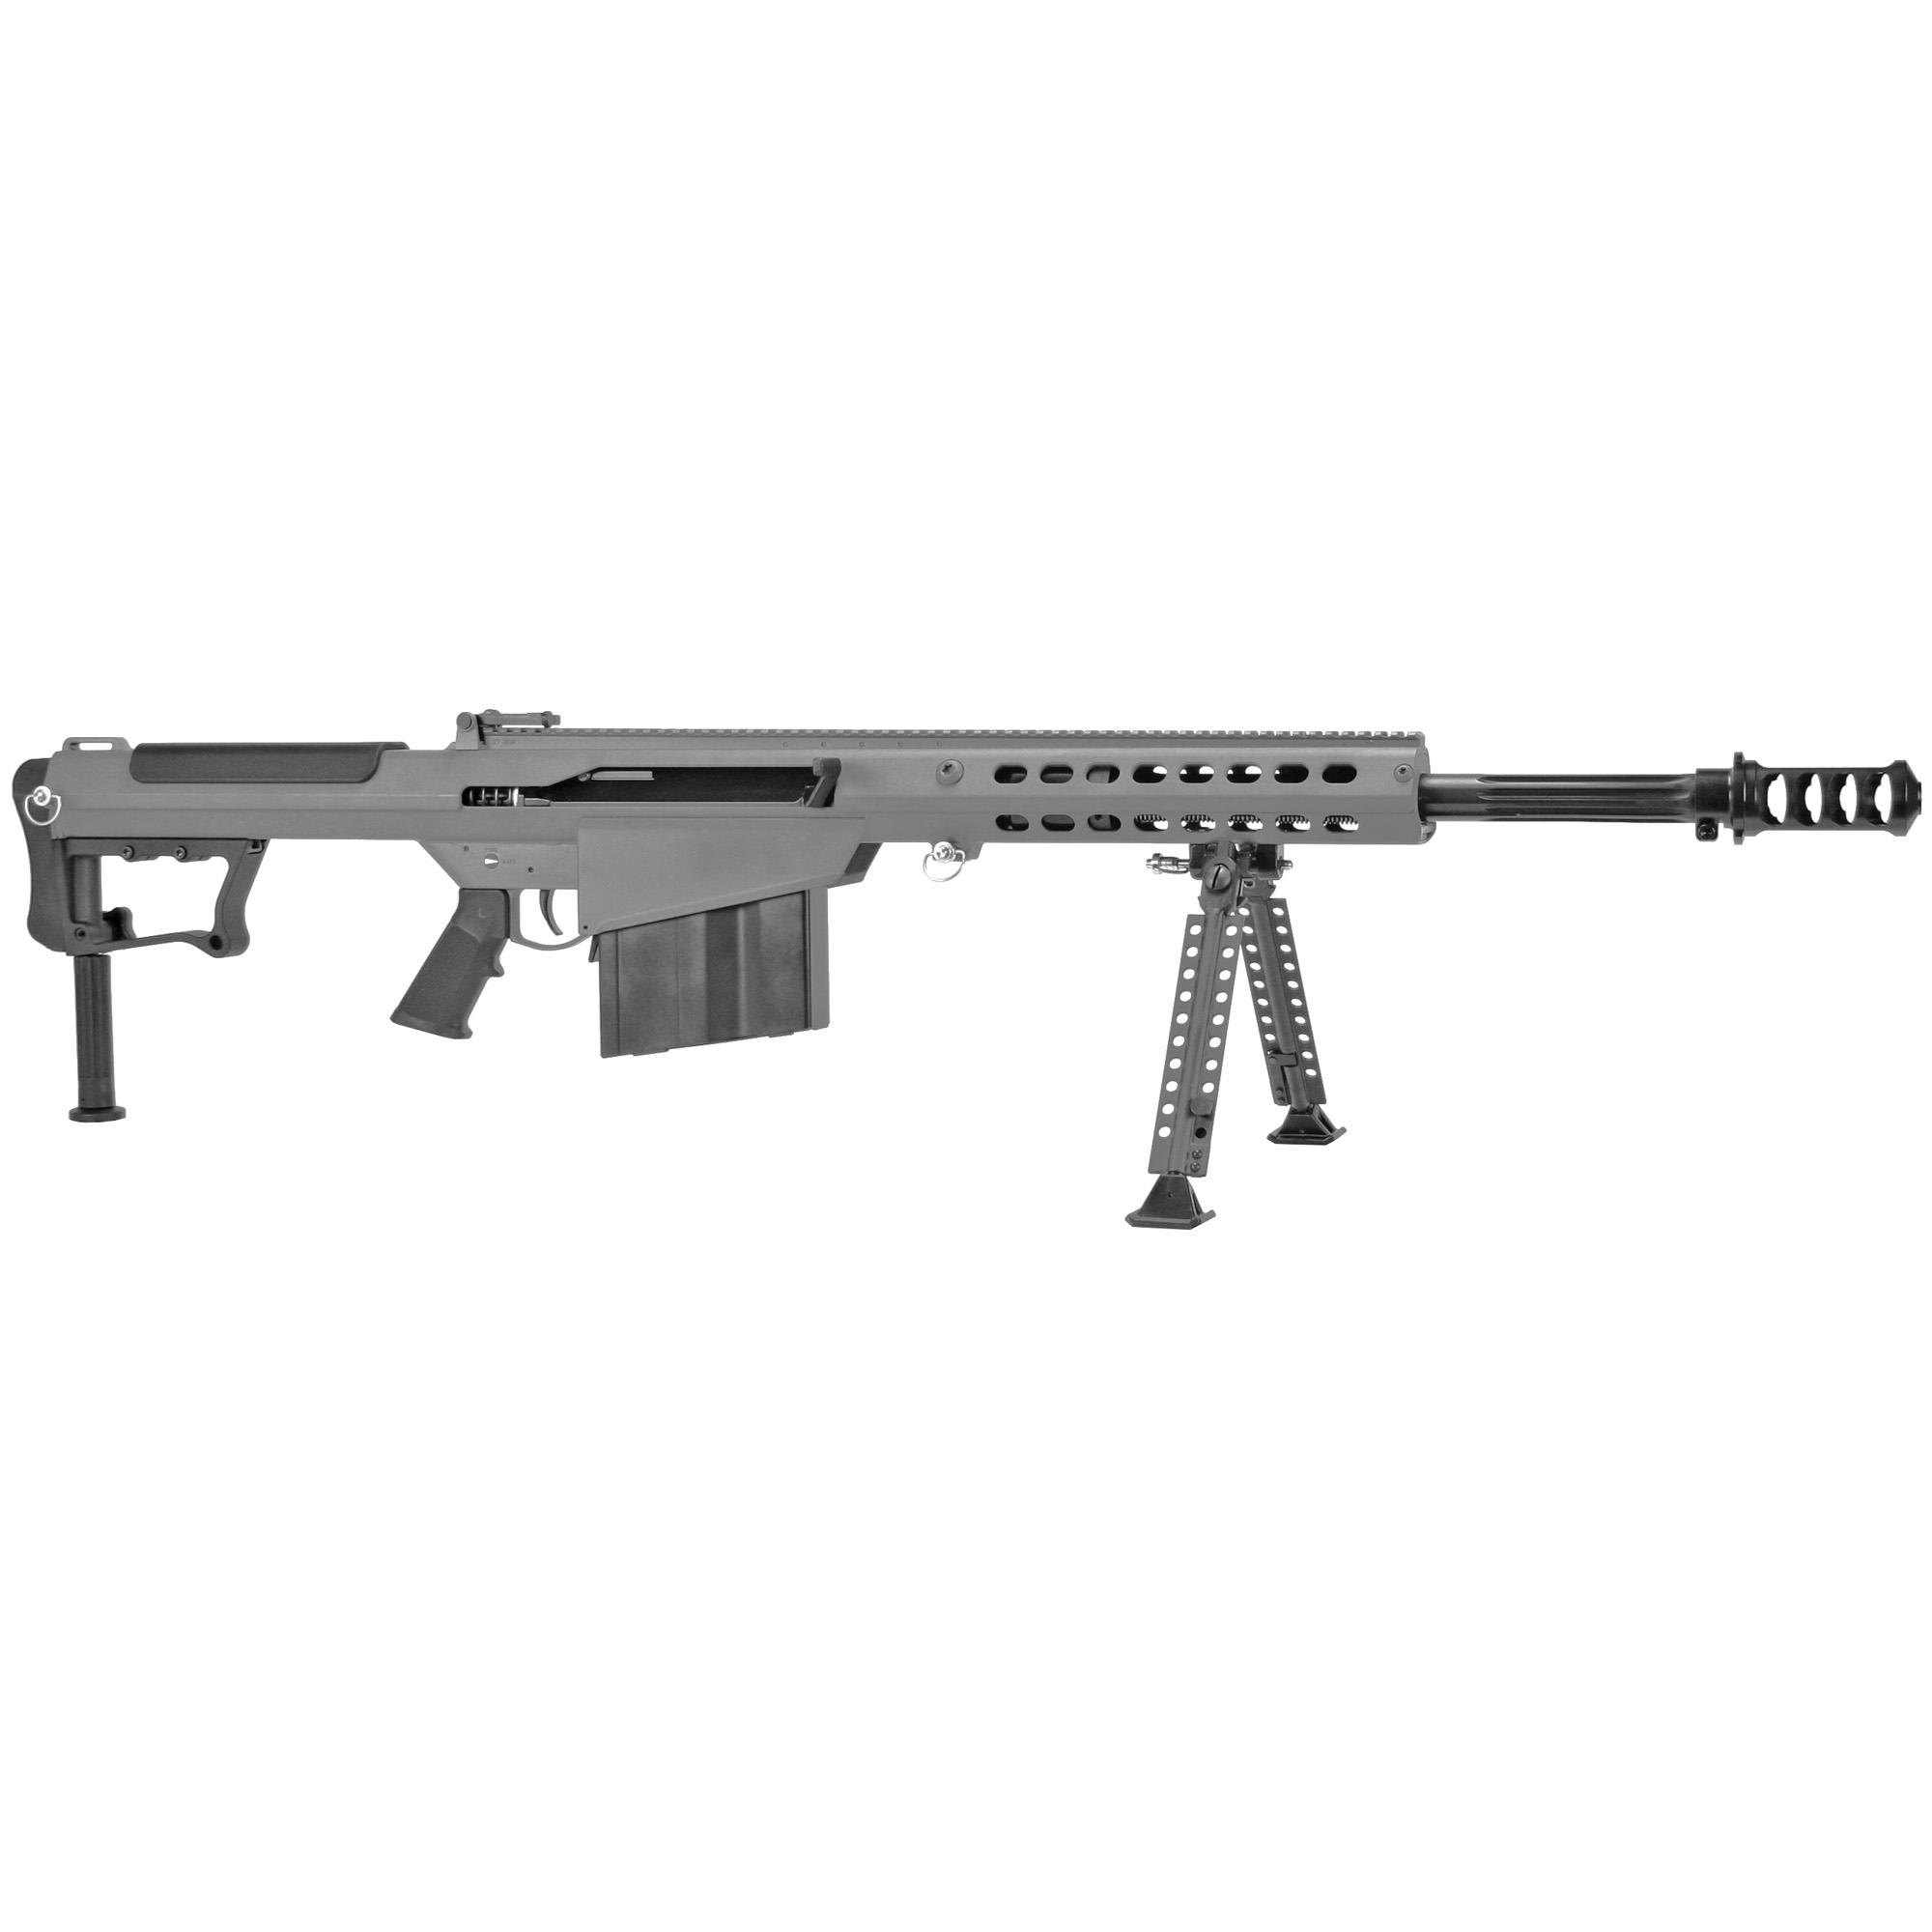 "Barrett M107a1 50bmg 20"" Gry 10rd"